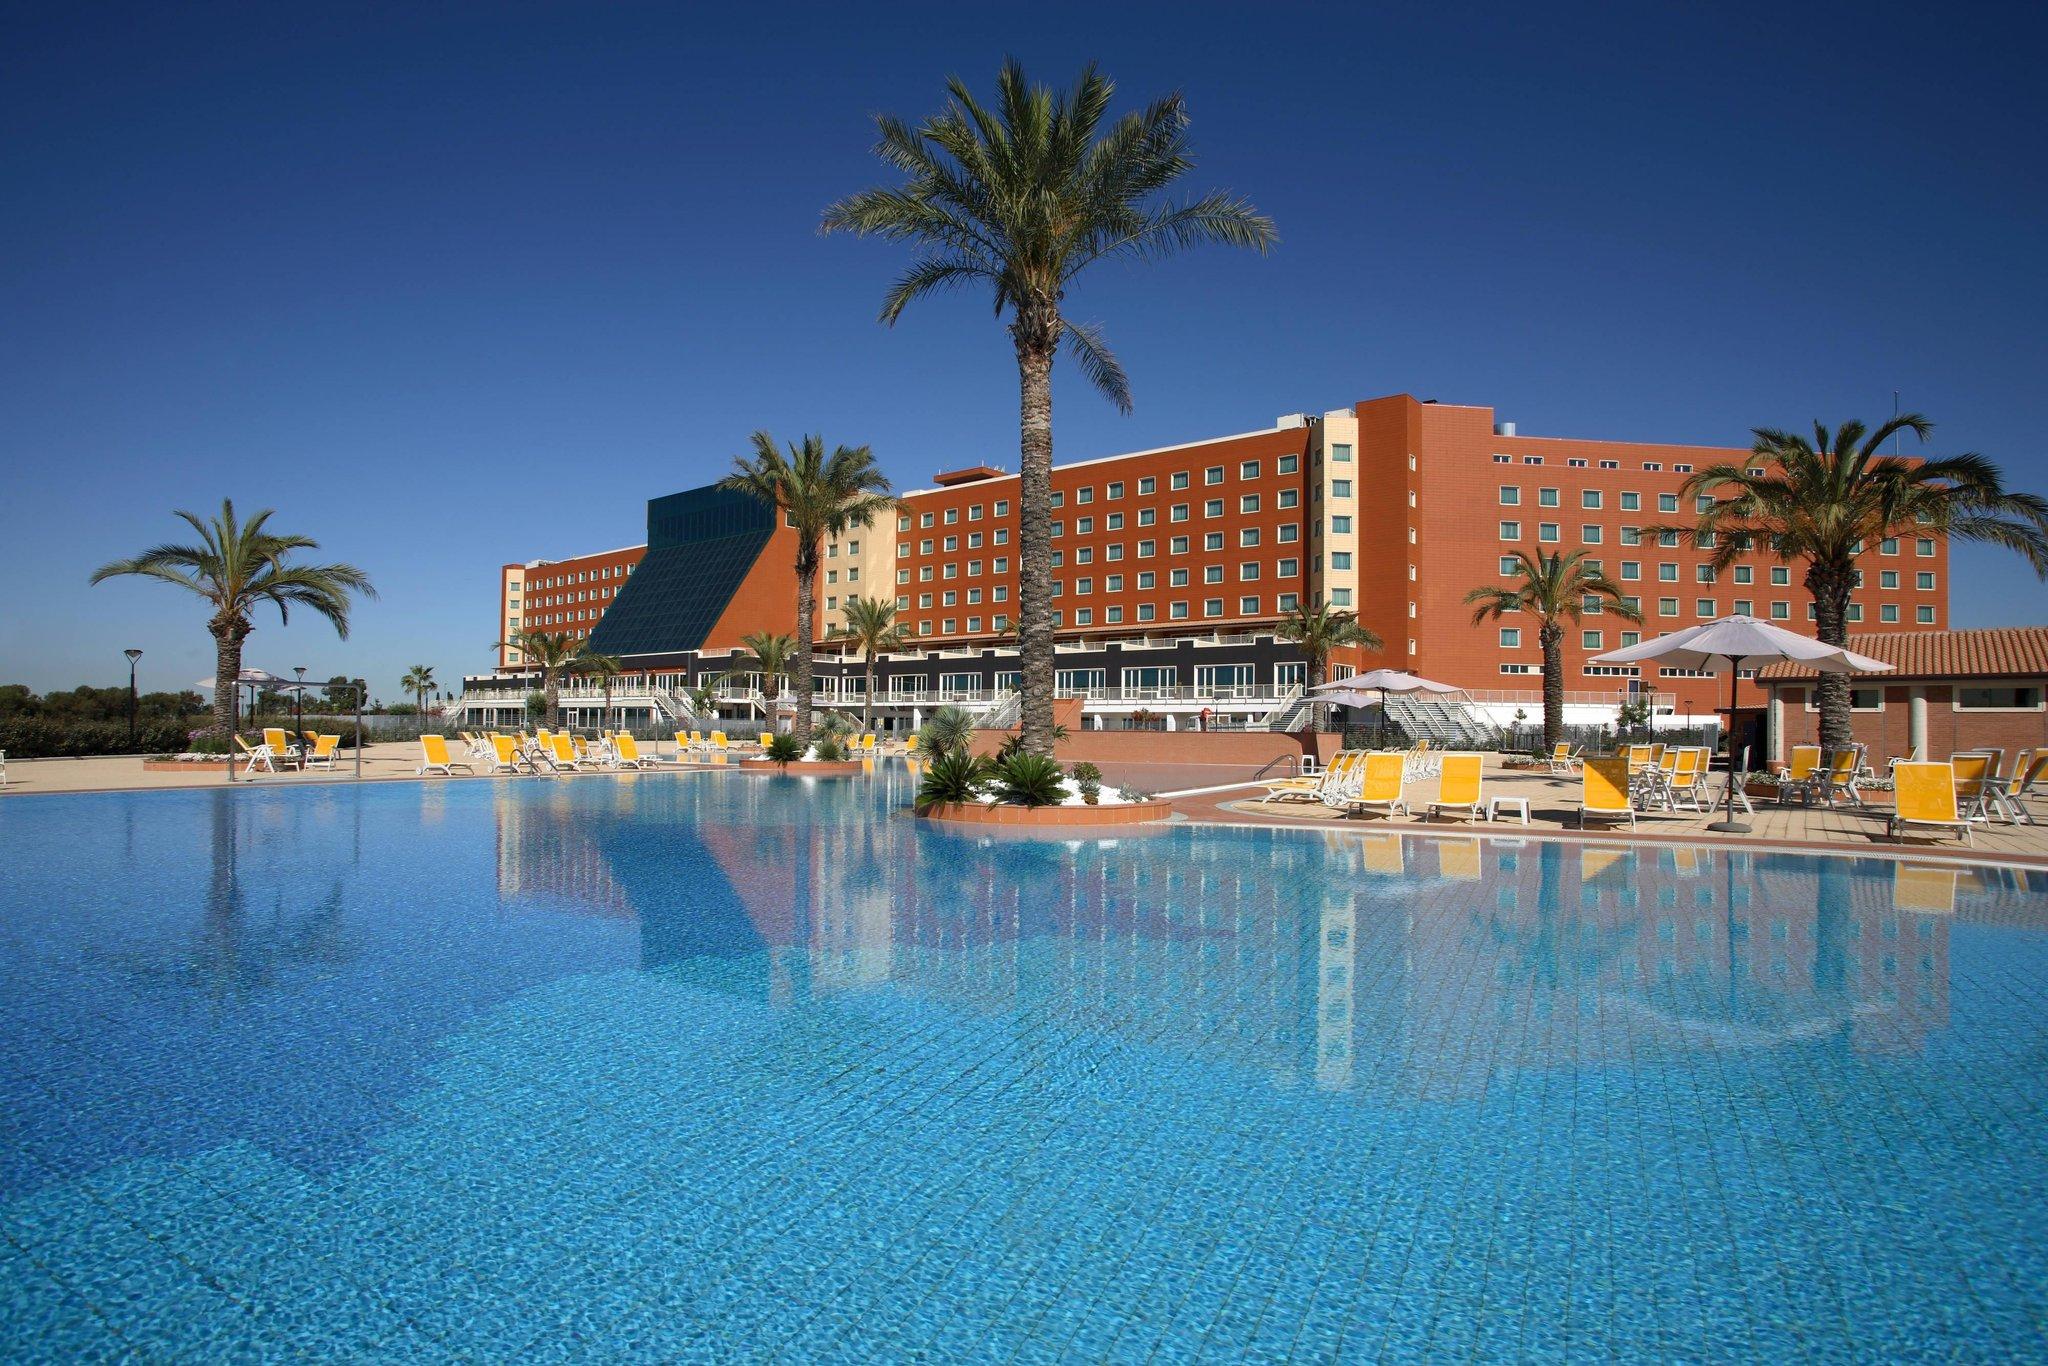 Marriott Park Hotel Rome